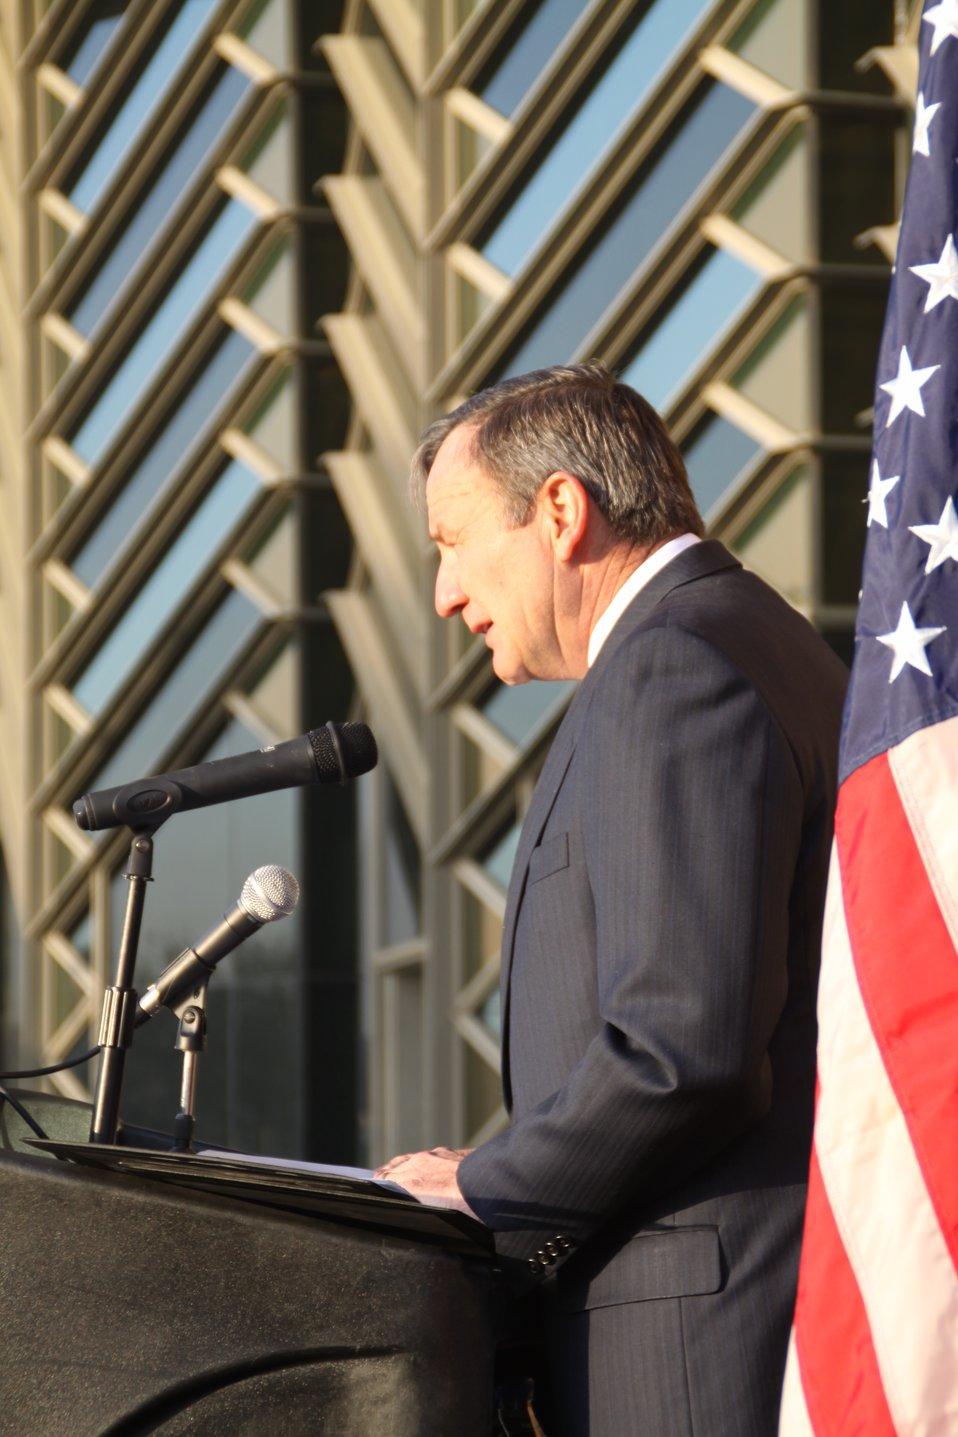 Ambassador Eikenberry